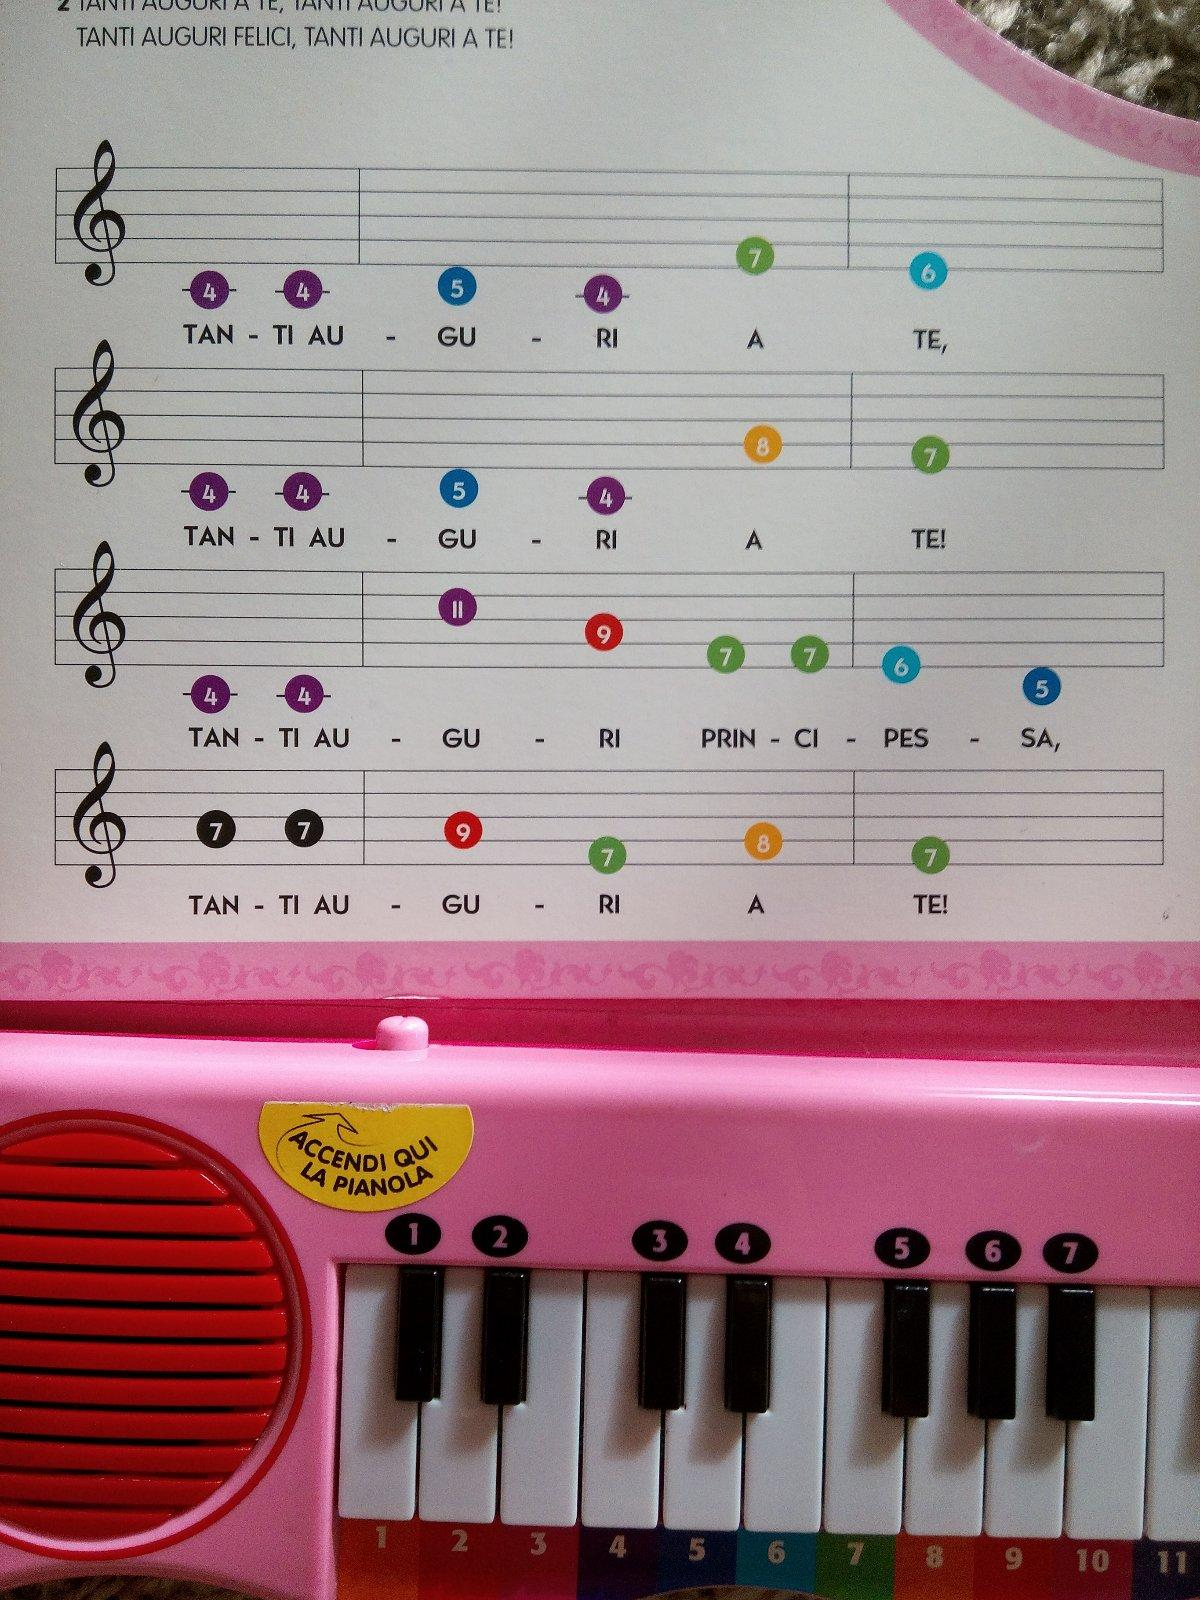 Ako sa naui hra na klavr?